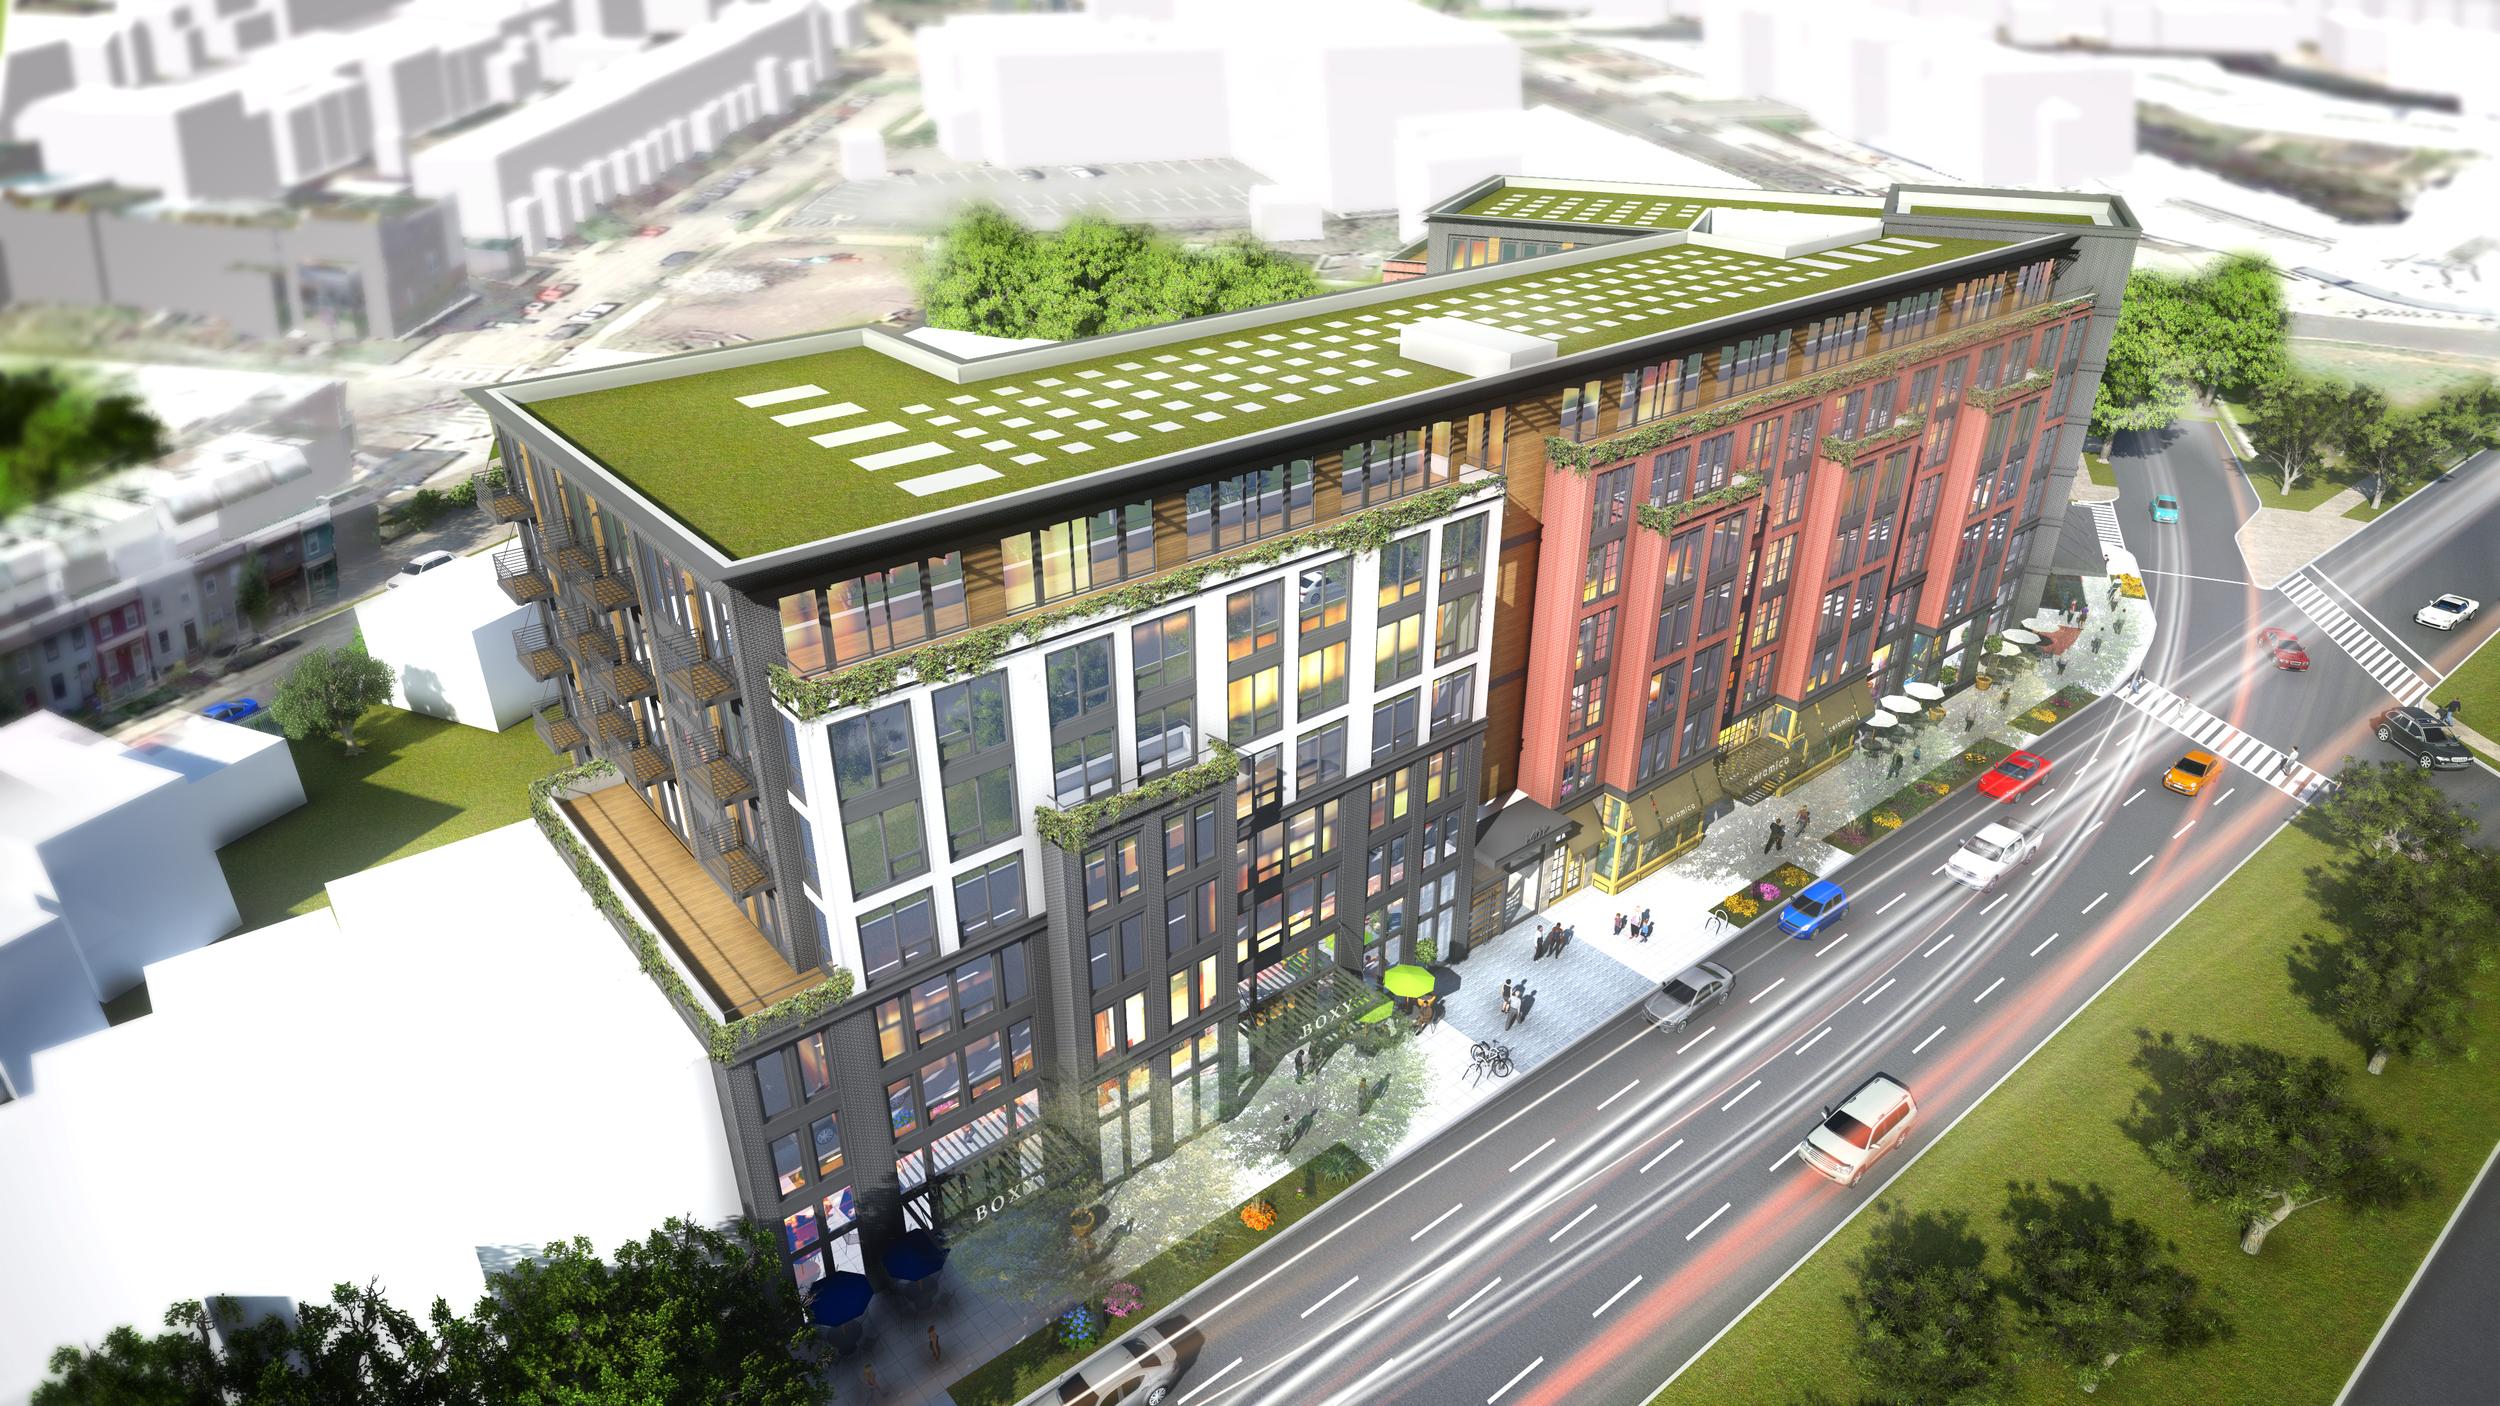 Project Location:  Washington, DC (Capitol Hill)   Project Developer:  CAS Riegler   Project Architect:  Antunovich Associates   Image By:  Antunovich Associates